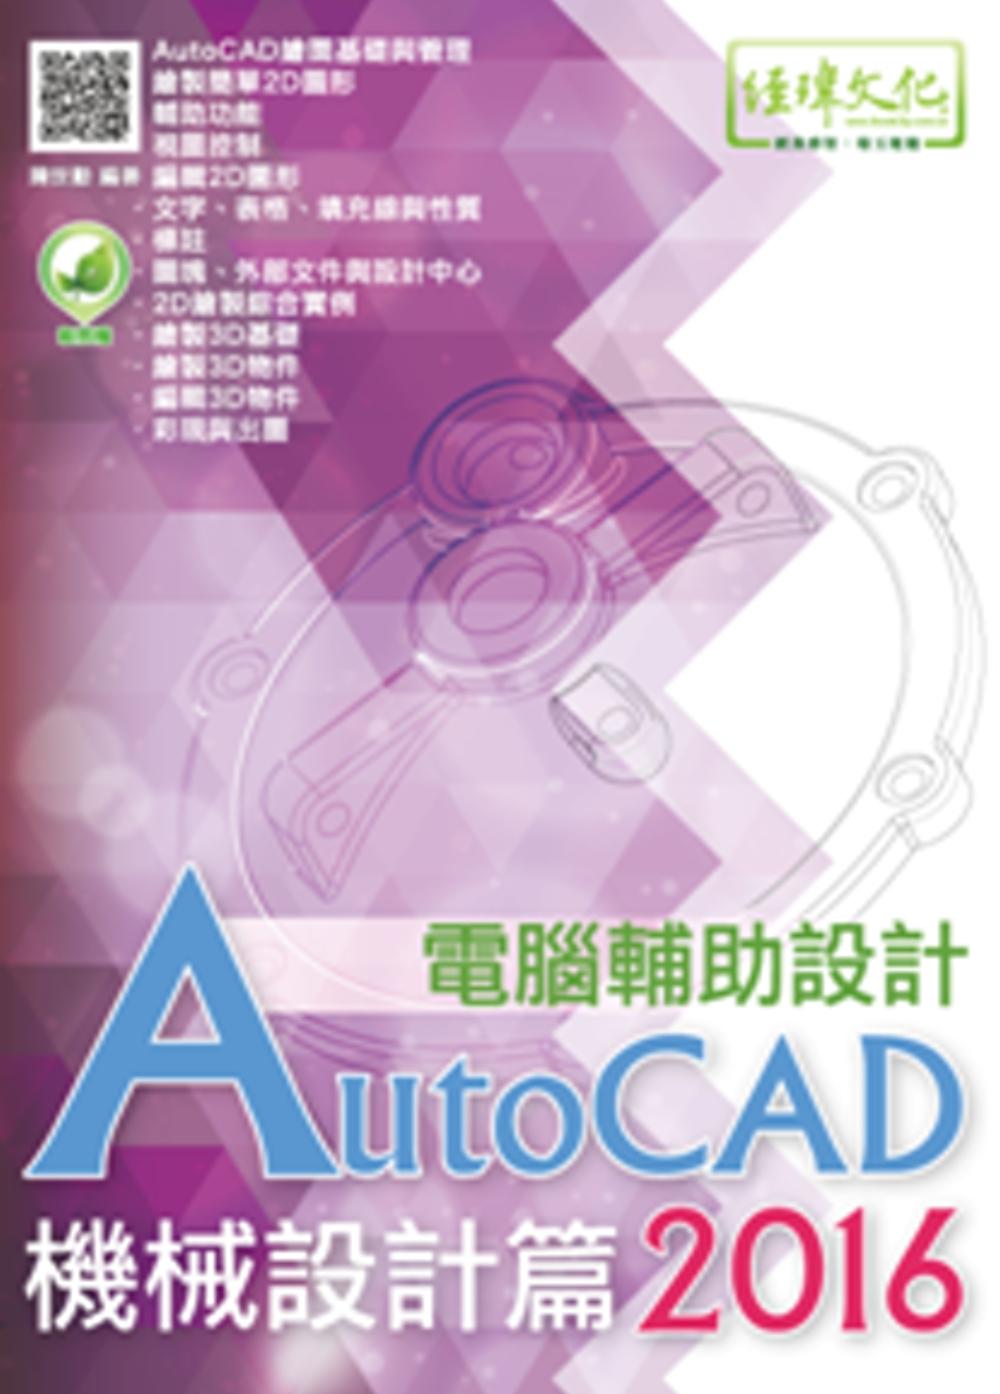 AutoCAD 2016 電腦輔助設計:機械設計篇(附綠色範例檔)